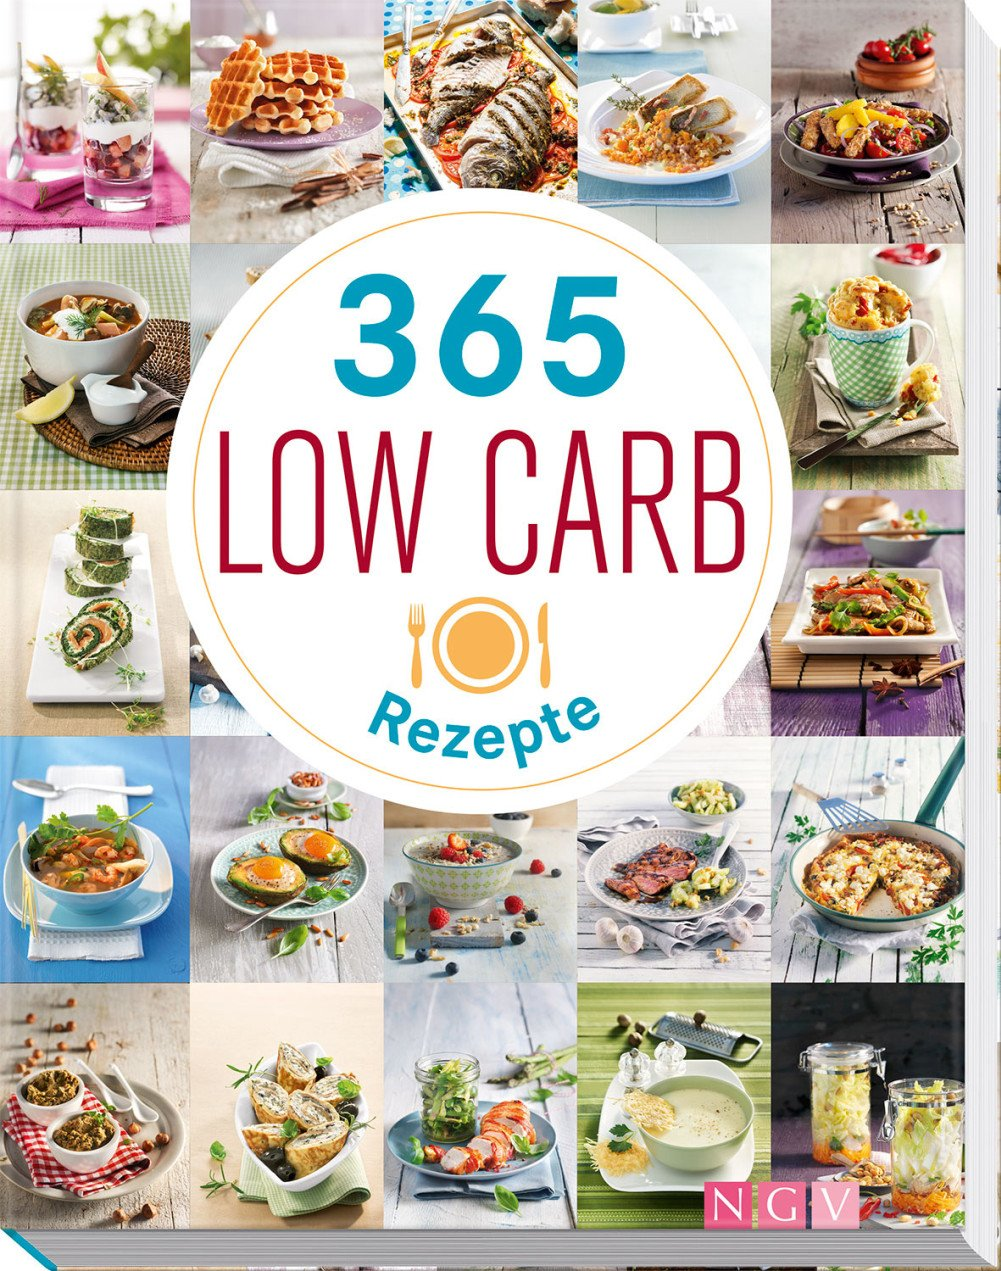 365 Low-Carb-Rezepte Gebundenes Buch – 1. März 2018 Naumann & Göbel 3625181398 Diät - Diätetik Gericht (Speise)